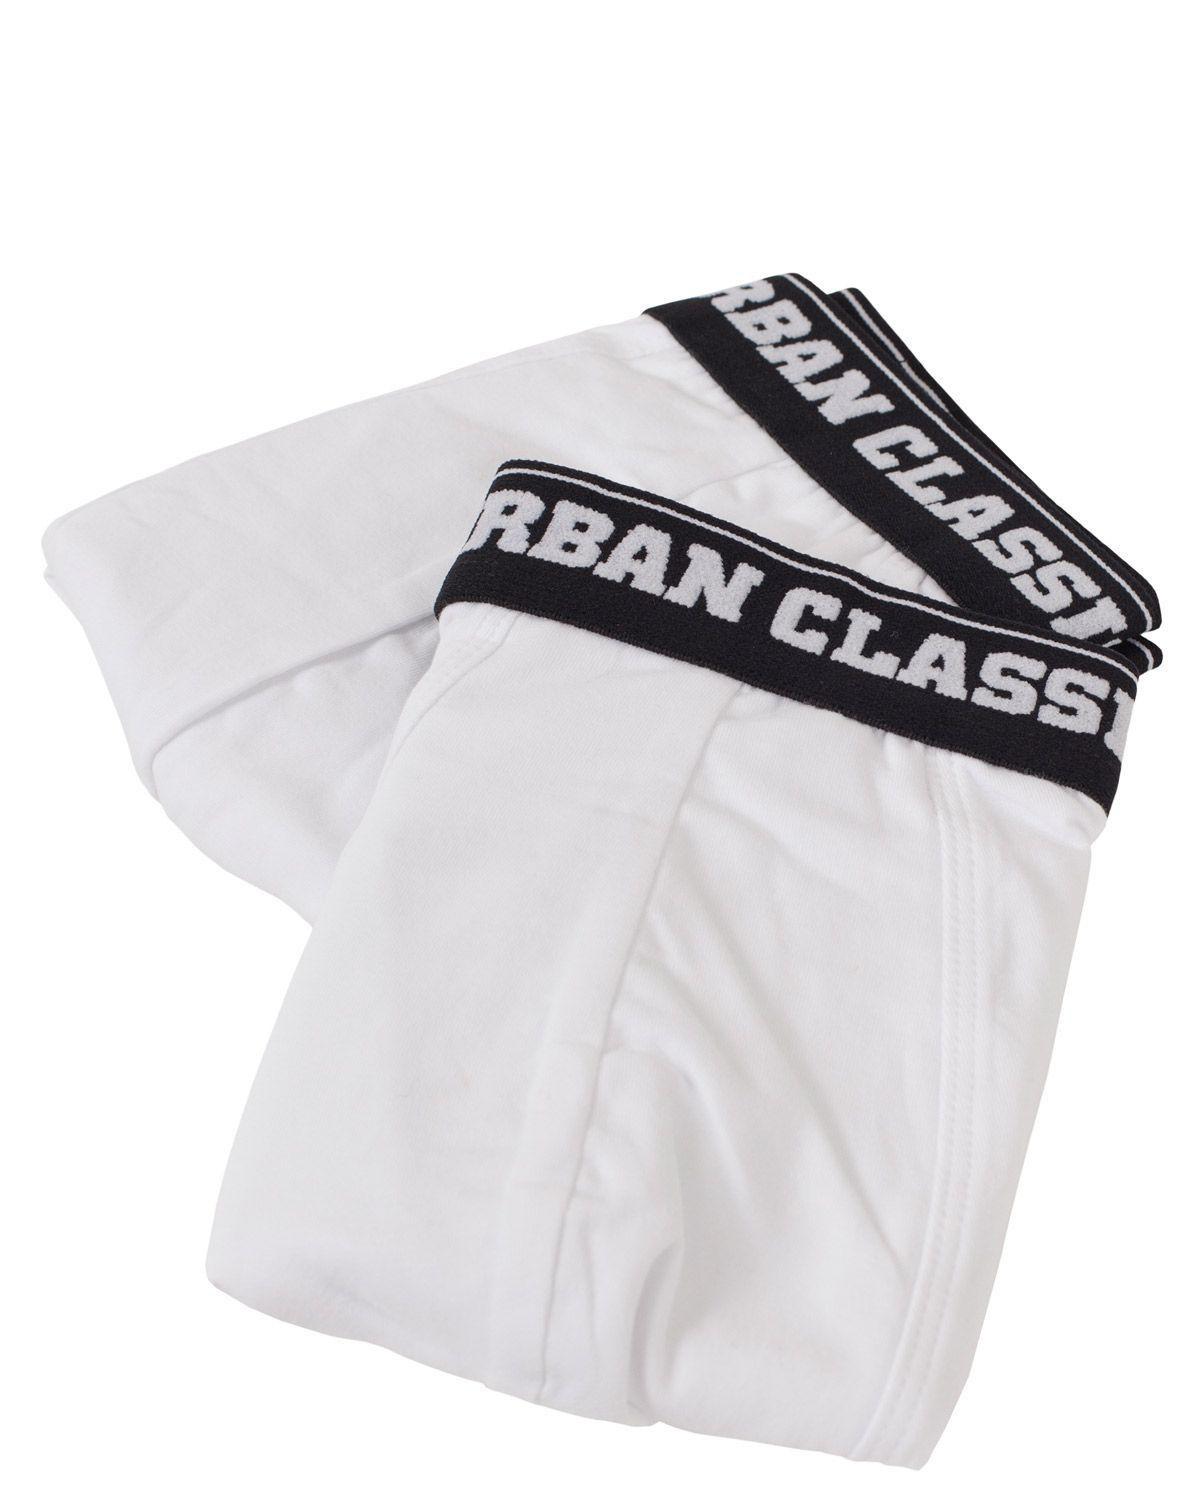 Image of   Urban Classics Boxershorts (Hvid / Hvid, L)